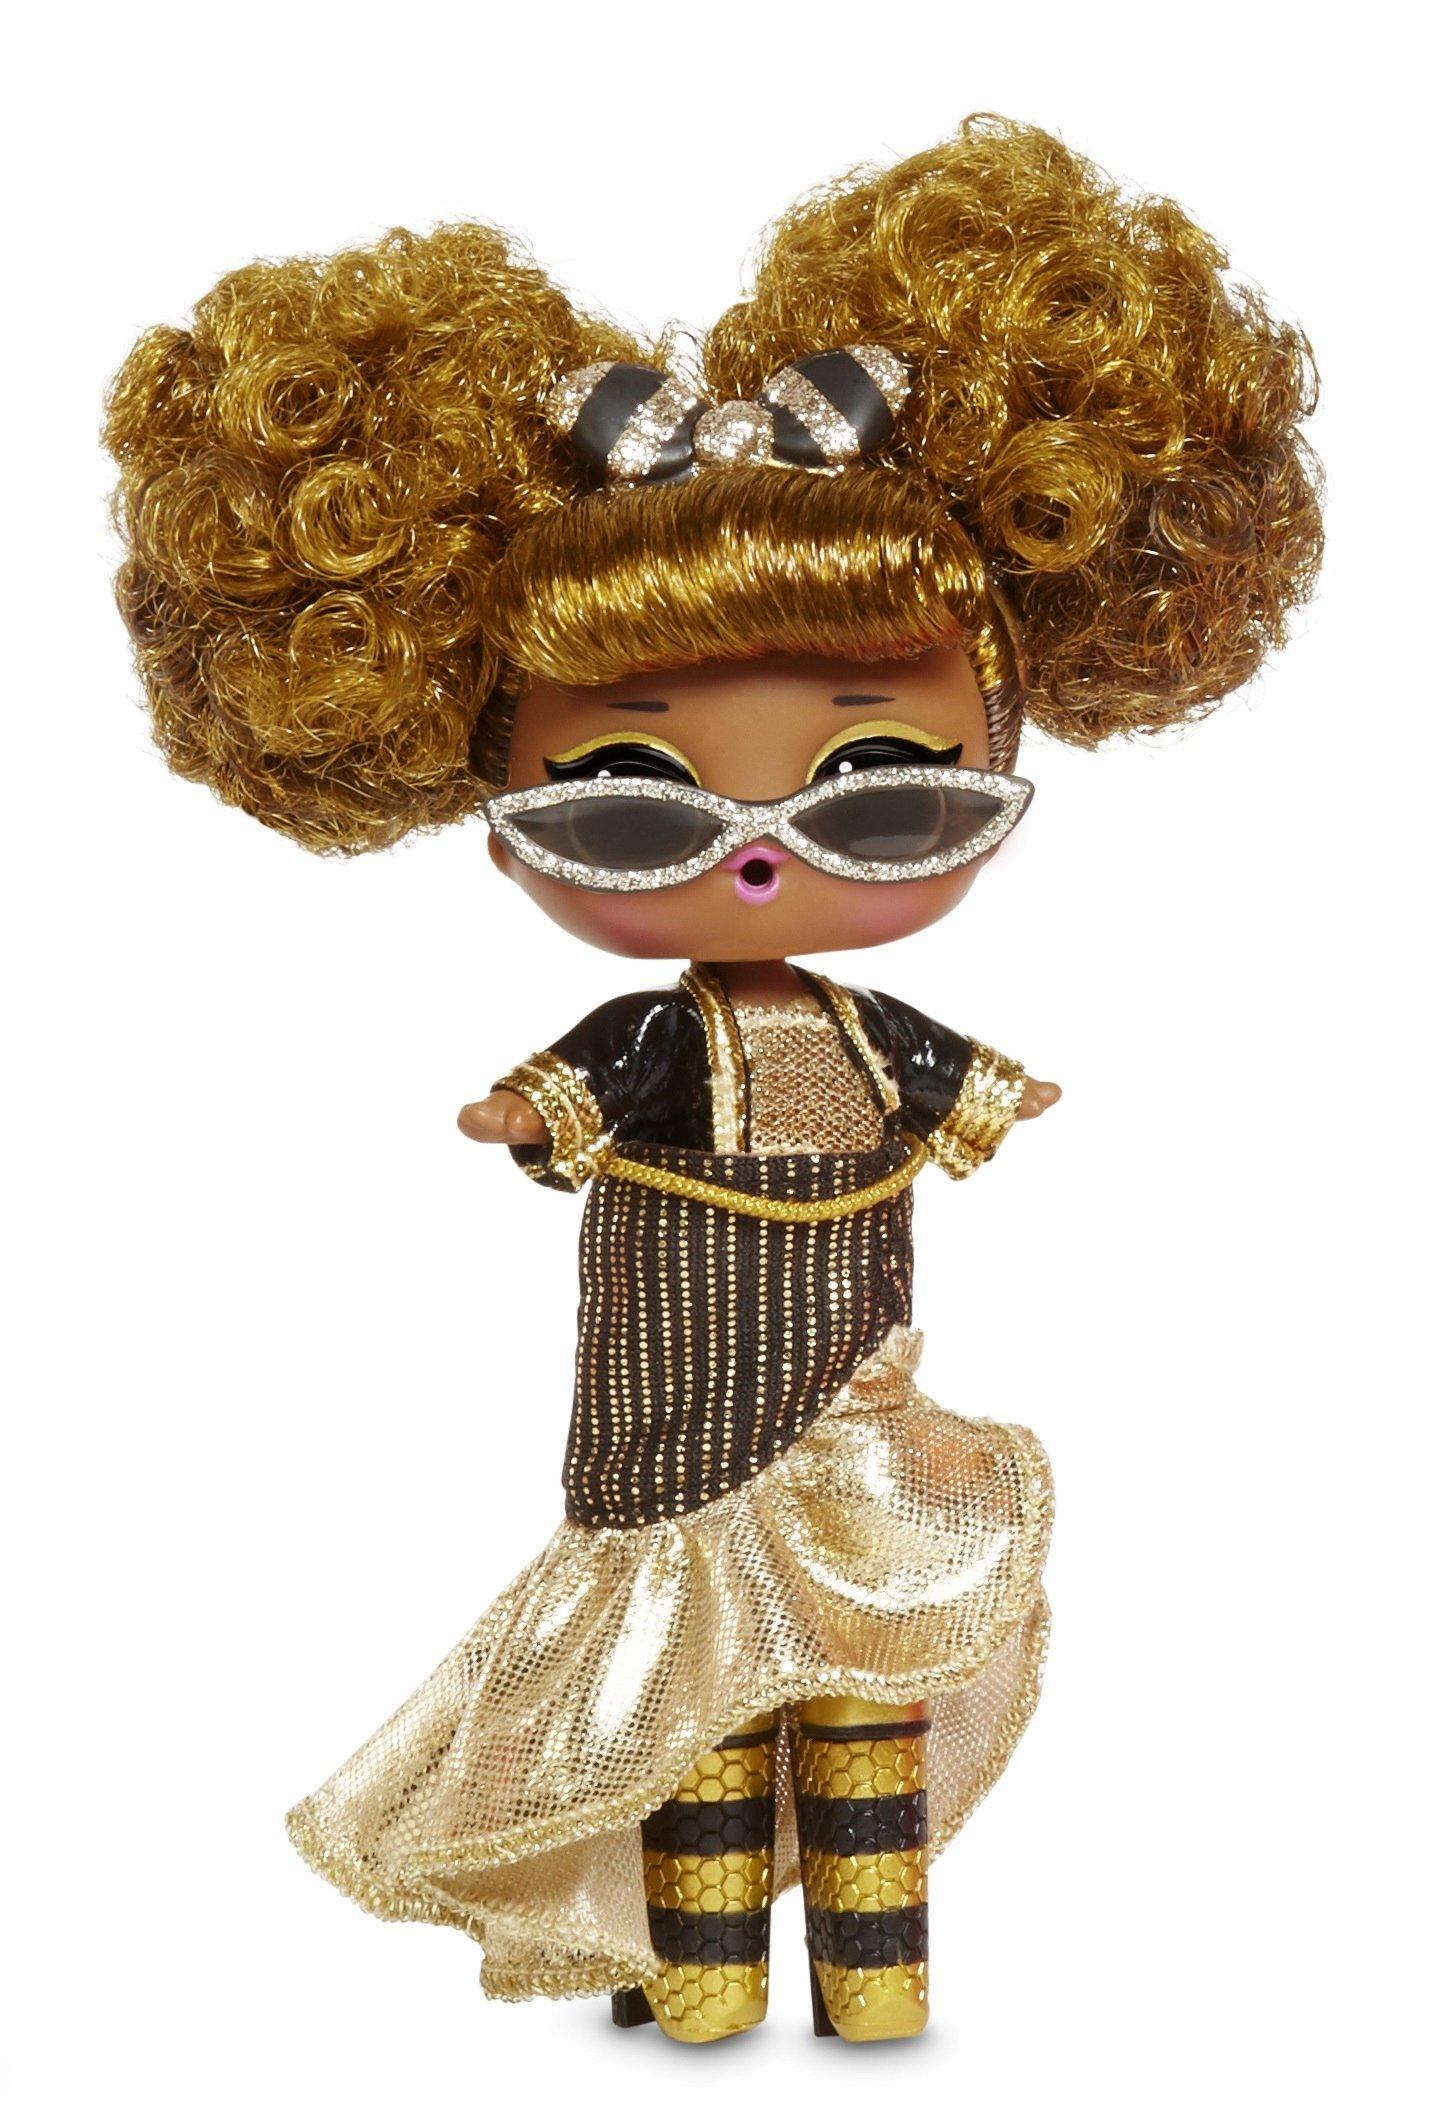 L.O.L. Surprise - J.K. Doll - Queen Bee